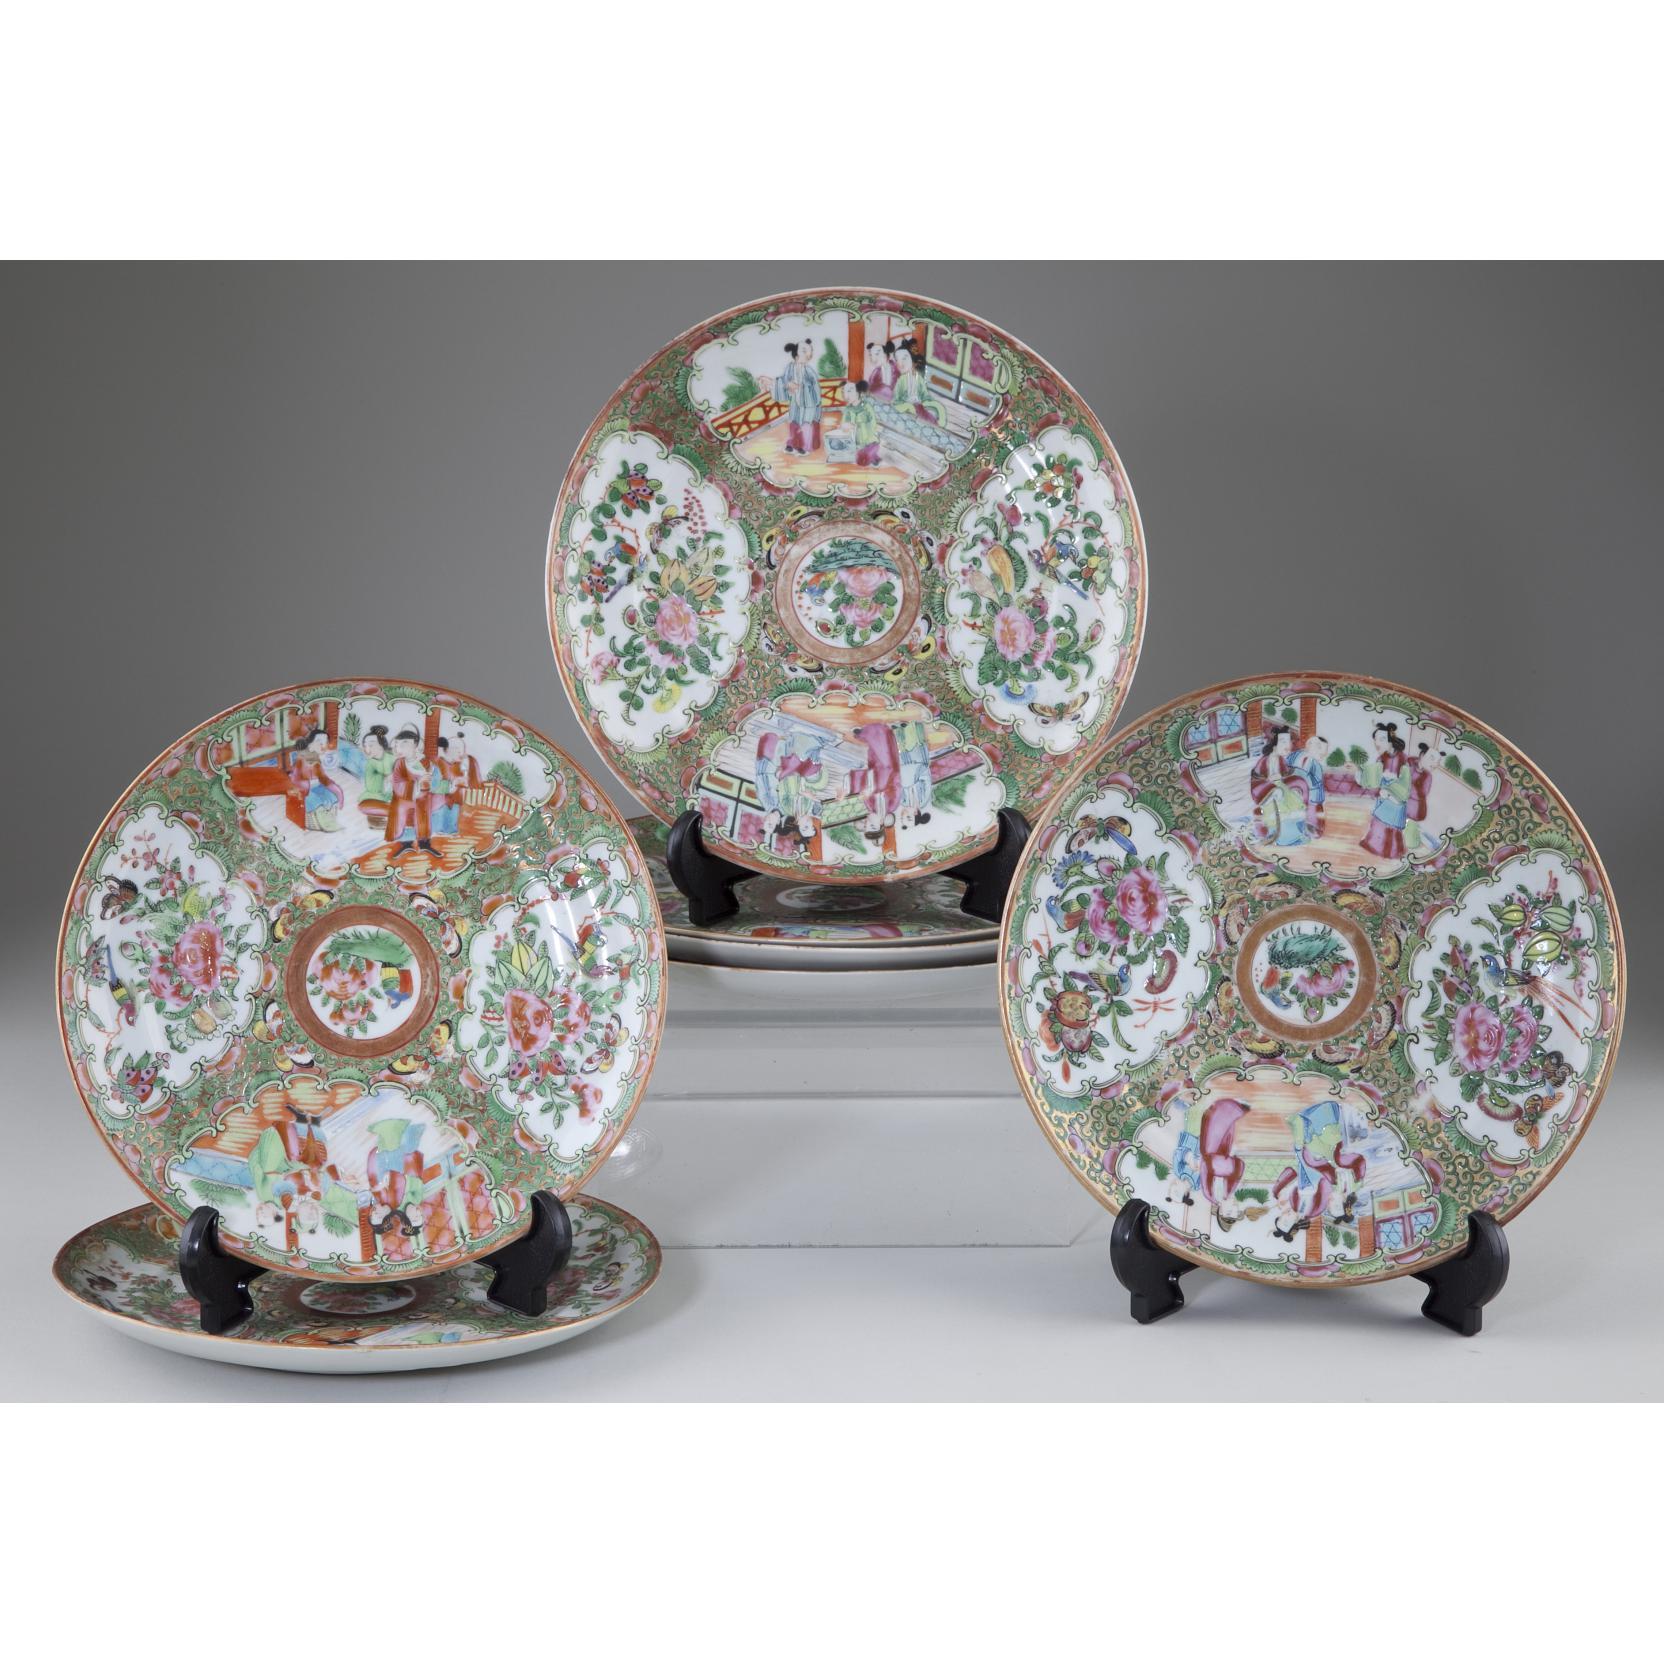 chinese-export-porcelain-rose-medallion-plates